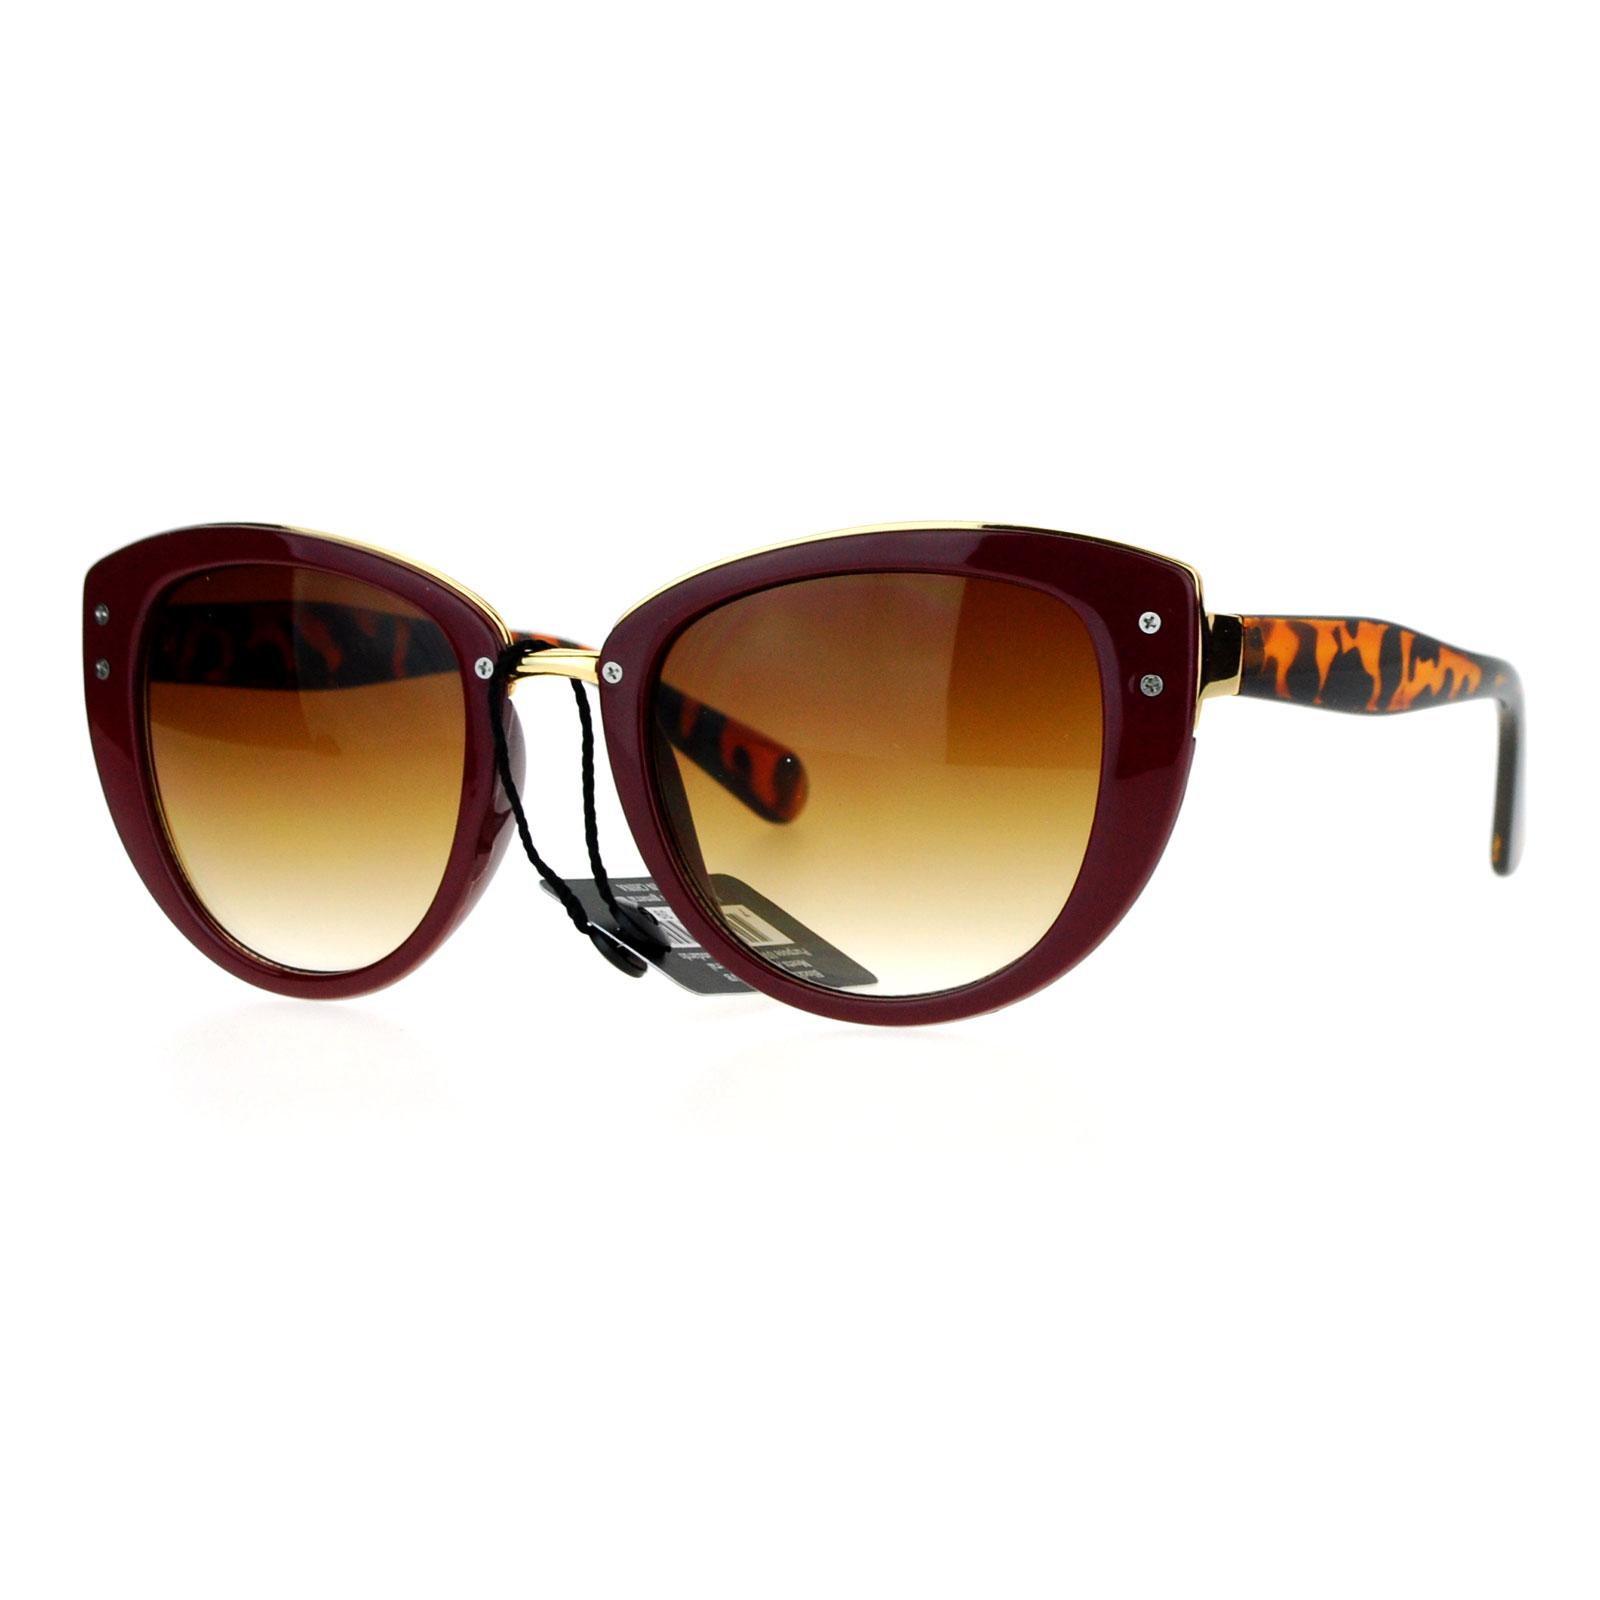 SA106 Metal Brow Oversize Cat Eye Designer Sunglasses Burgundy